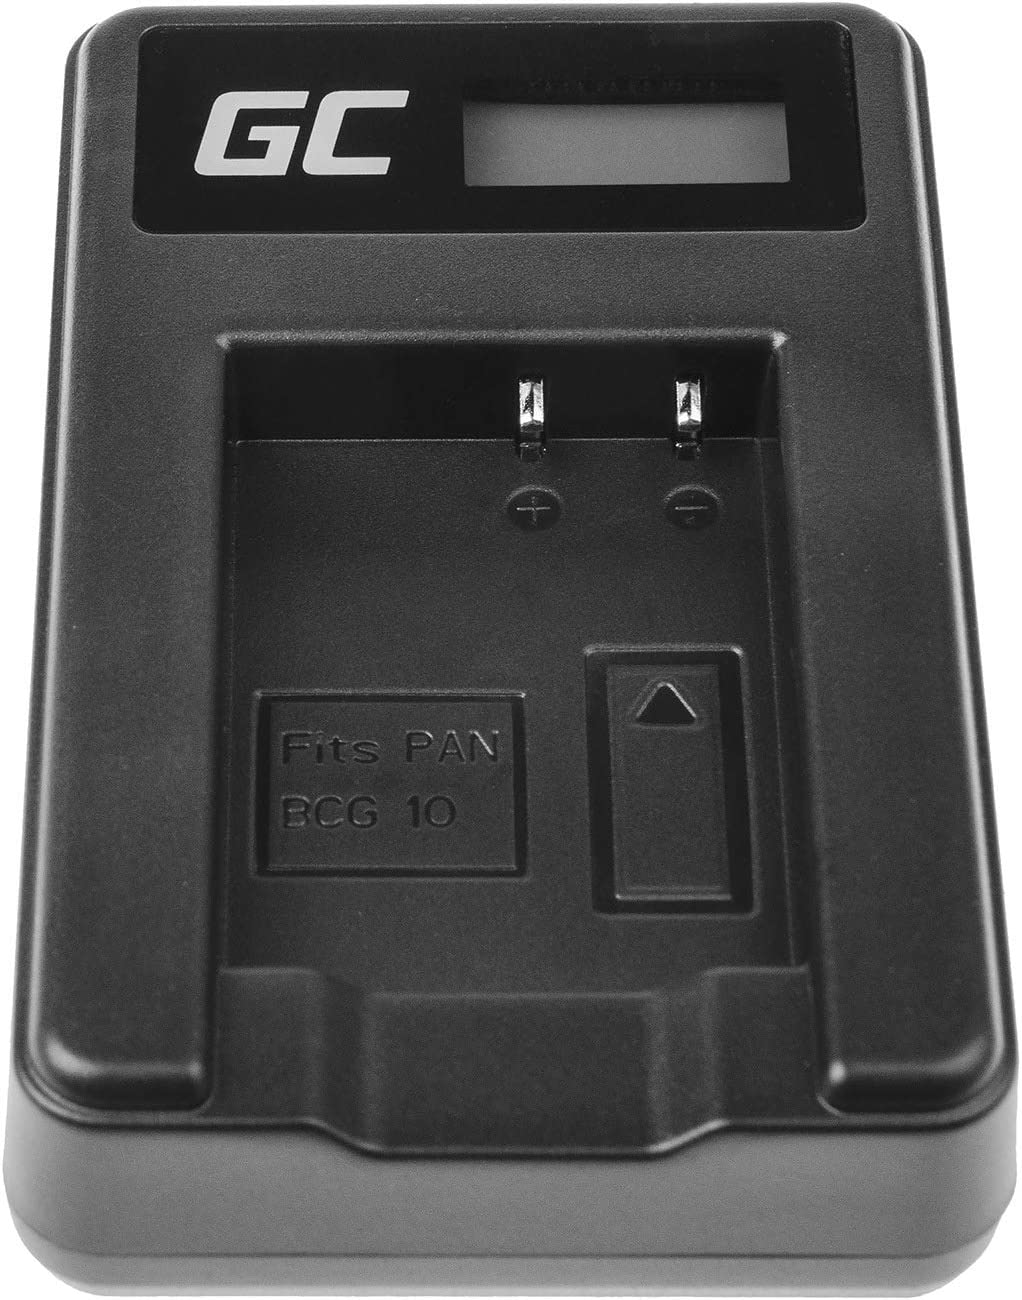 5W 8.4V 0.6A Schwarz Green Cell/® DE-A65BB Ladeger/ät f/ür Panasonic DMW-BCG10 Akku und Lumix DMC-TZ7 TZ8 TZ10 TZ20 TZ25 TZ6 TZ18 TZ29 TZ30 TZ31 TZ36 TZ31 TZ66 ZS1 ZS3 ZS5 ZS10 ZS20 ZR1 ZR3